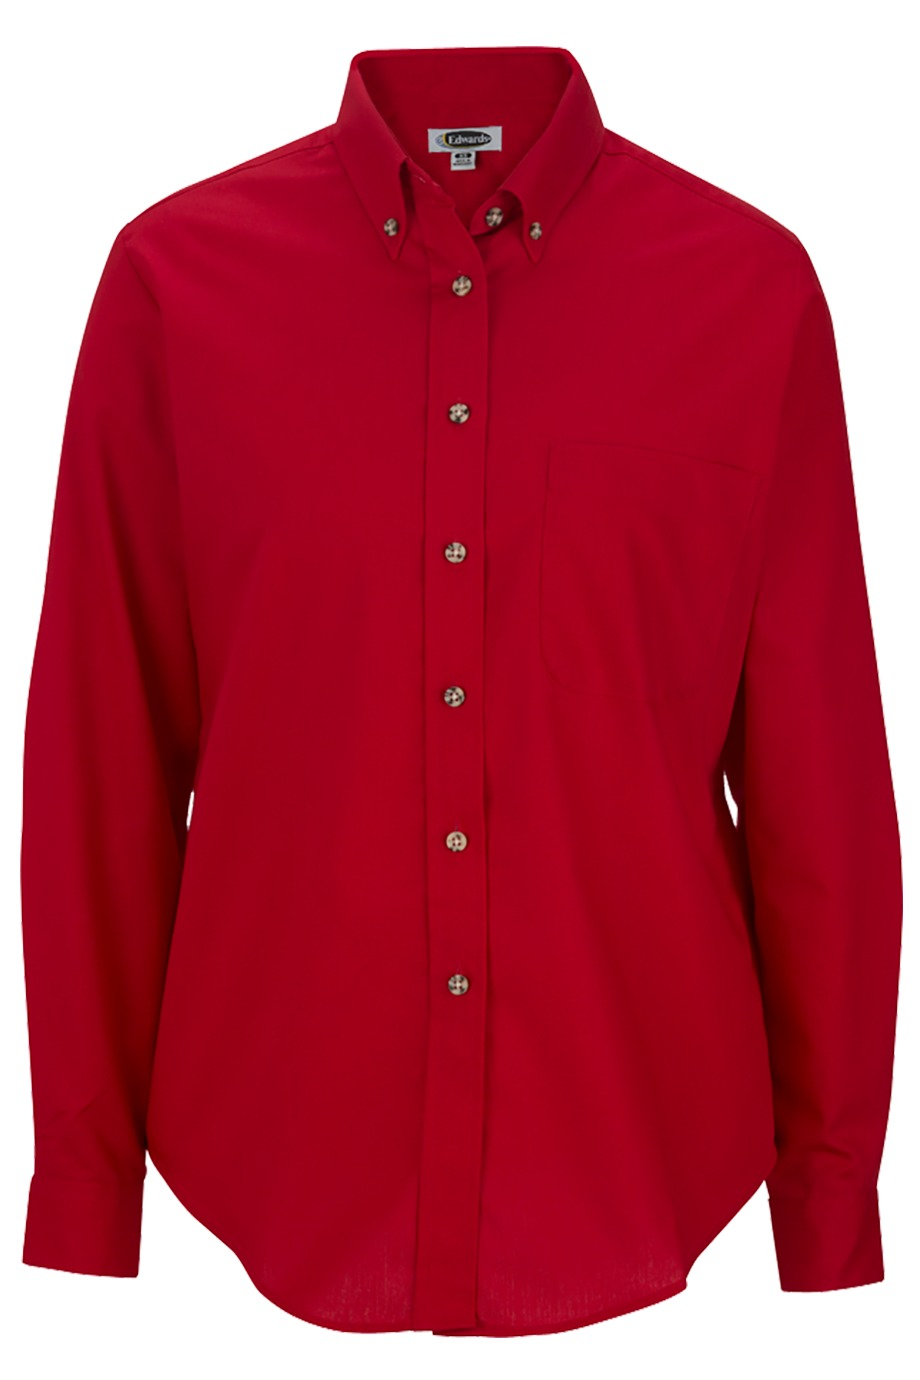 Edwards Garment 5280 - Women's Easy Care Long Sleeve Poplin Shirt